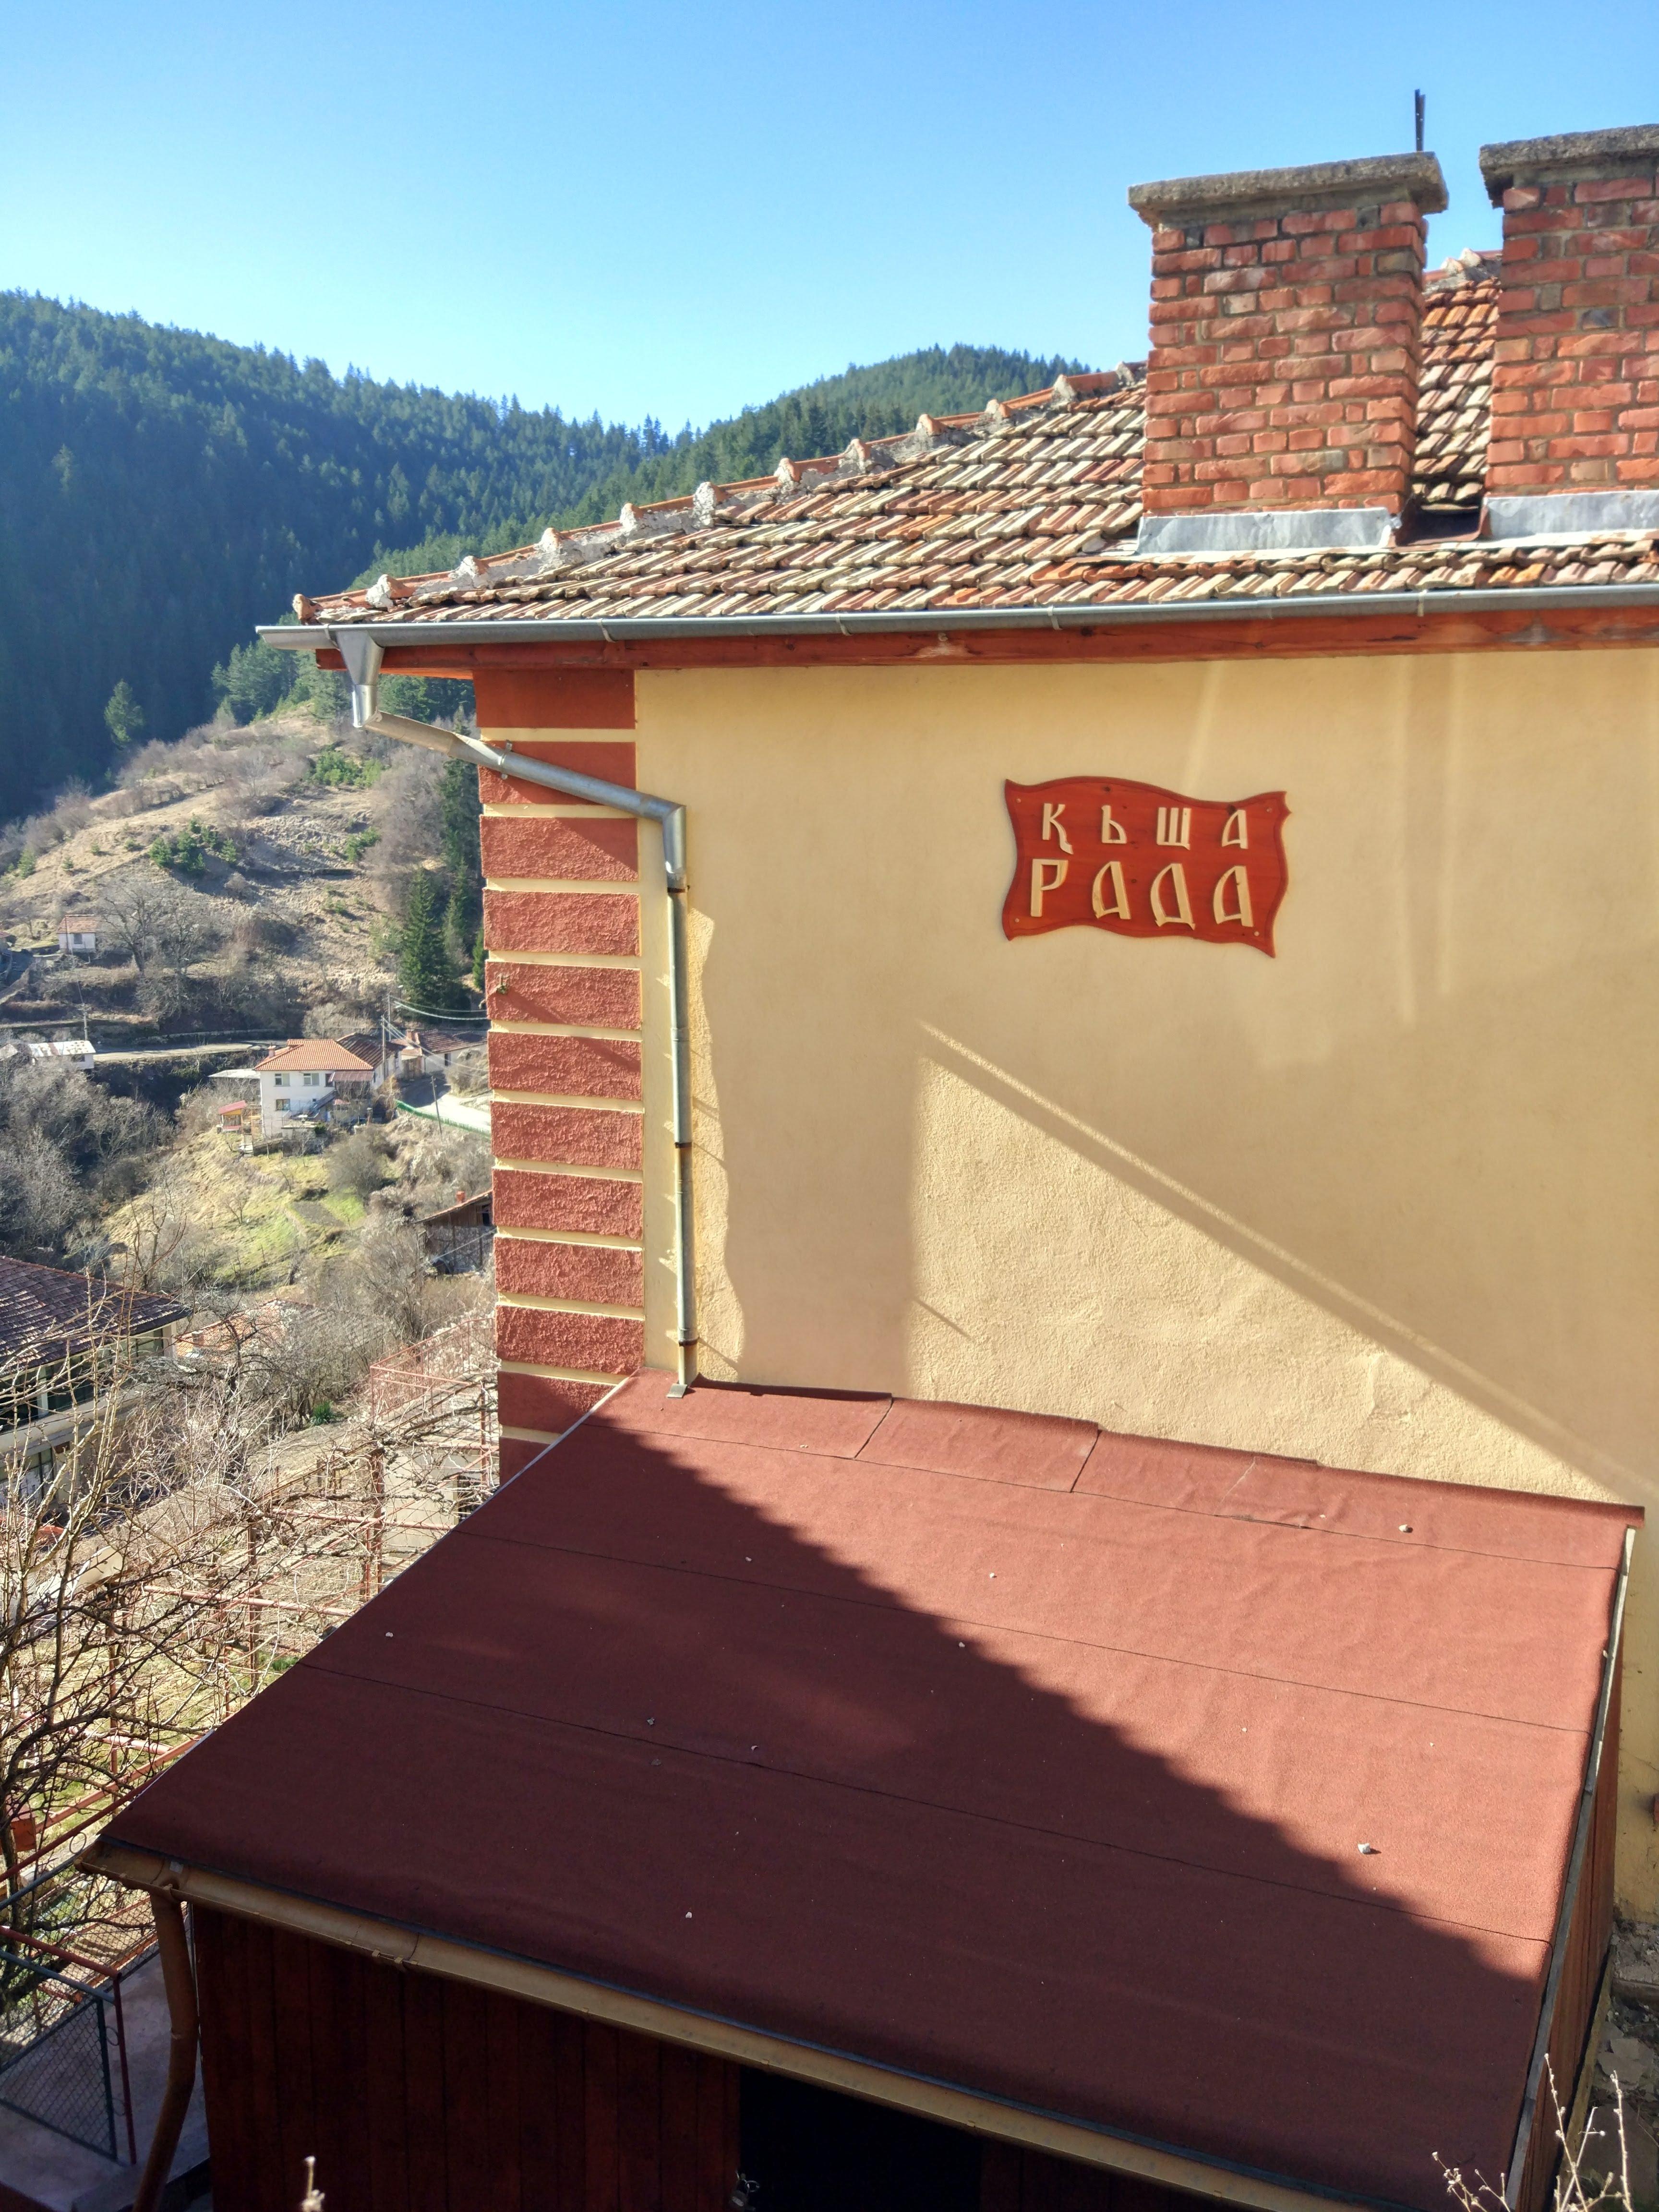 #traditional #house #bulgaria #traditional #Bulgarian #name #rada #Rodopi #mountain